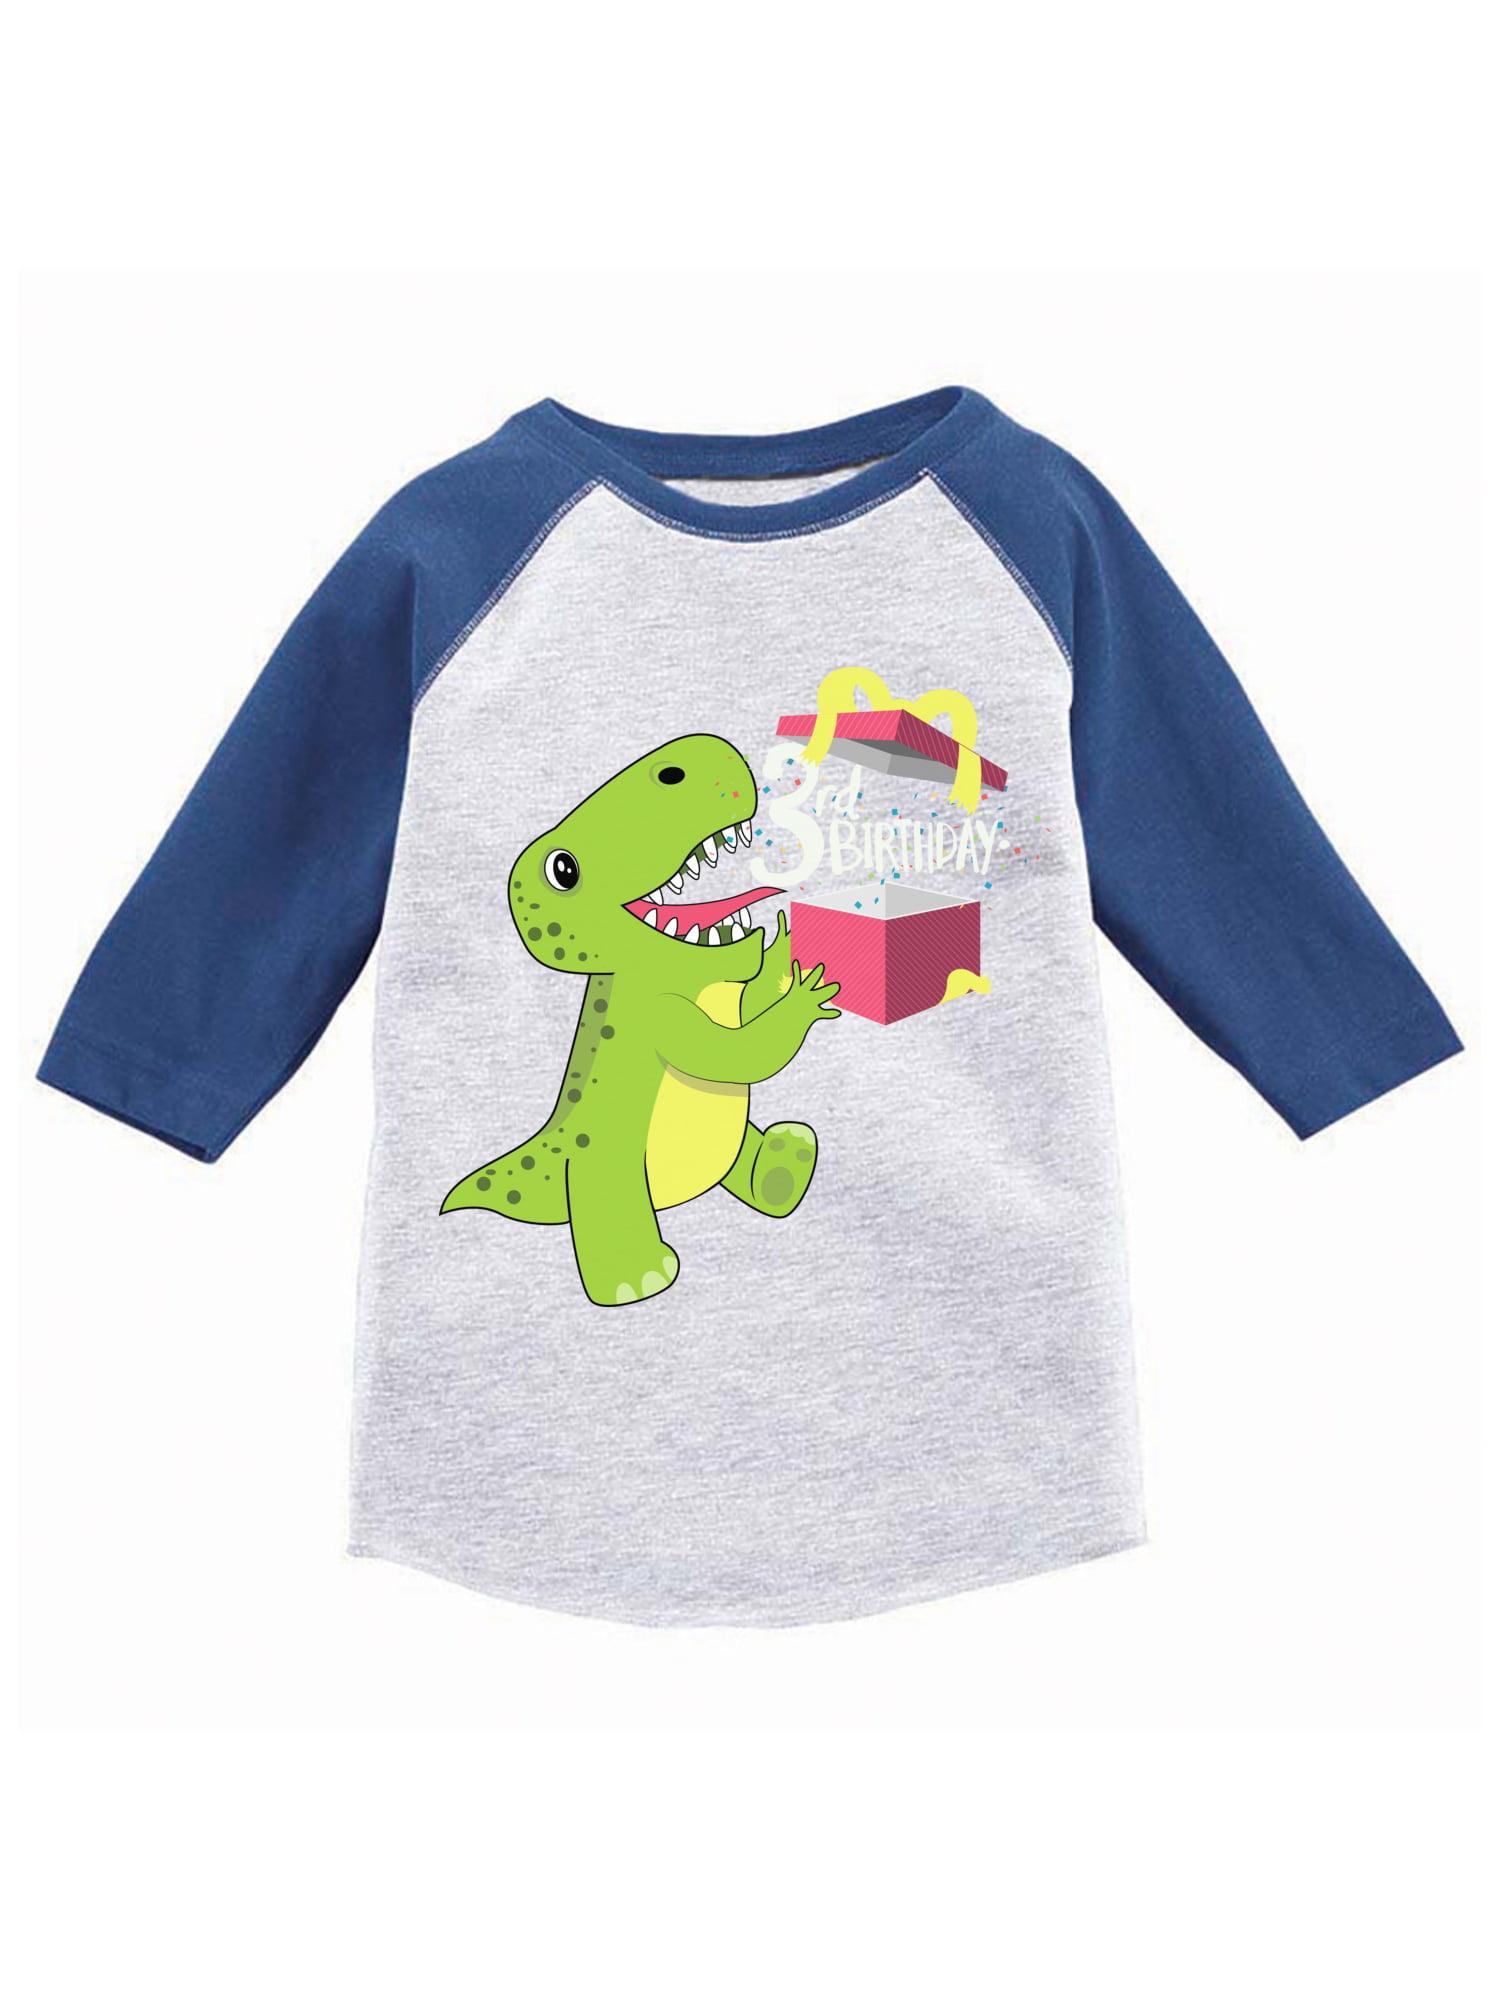 4ed189dd5 Awkward Styles Dinosaur Birthday Toddler Raglan Jersey Shirt For 3 Year Old  3rd Gifts Boy Baseball